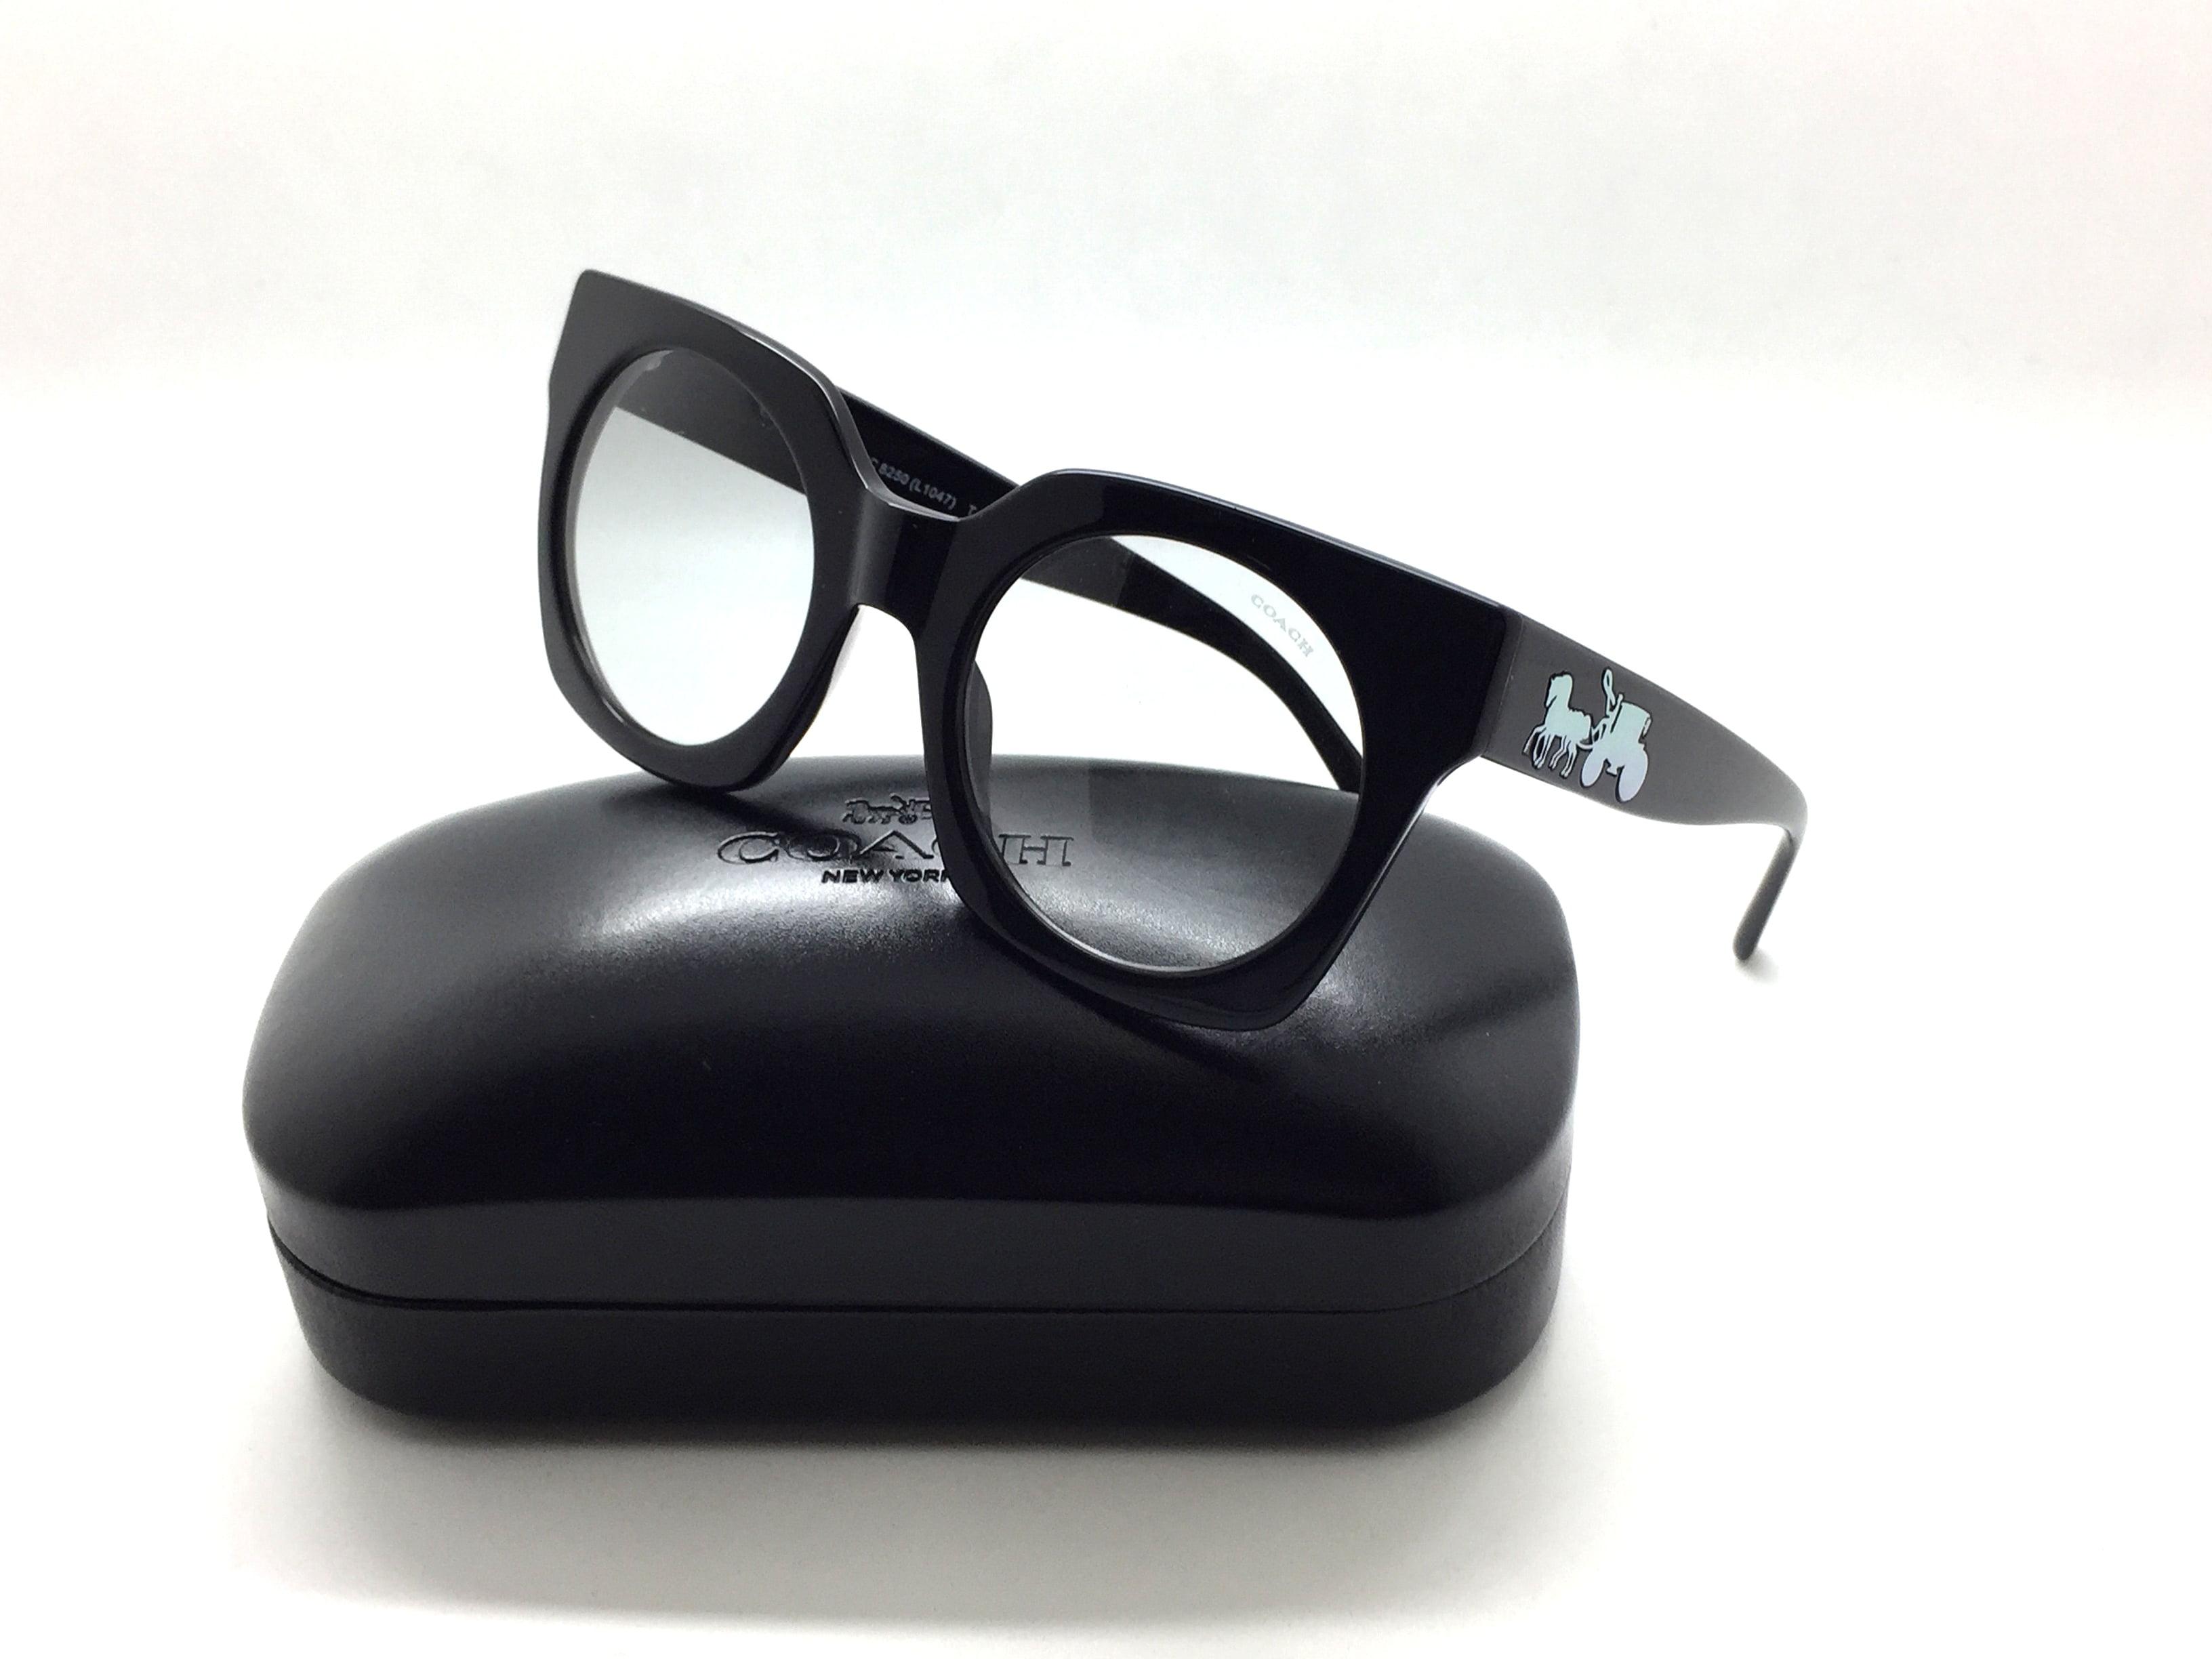 743af8ca9a8 Coach - Coach Women s HC8250 HC 8250 500287 Solid Black Fashion Round  Sunglasses 51mm - Walmart.com